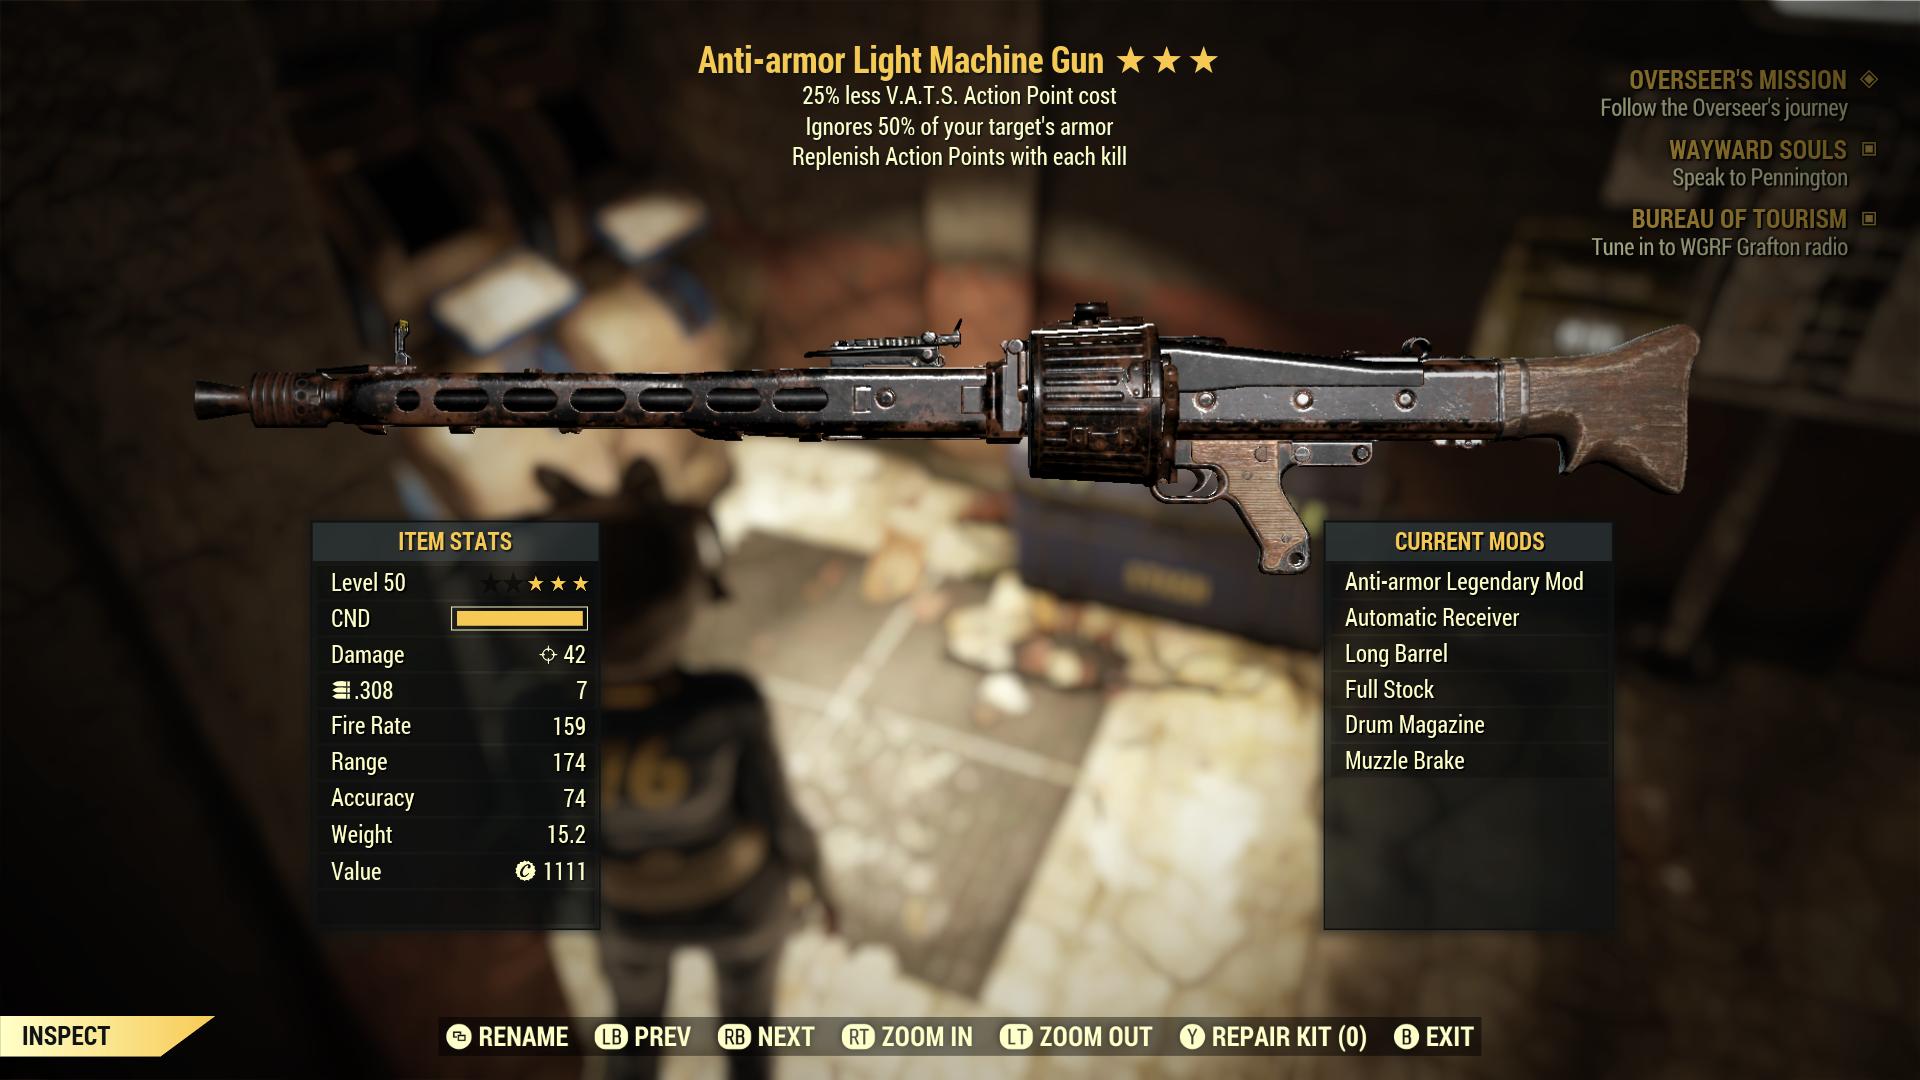 (New86)Anti-armor Light Machine Gun - Level 50